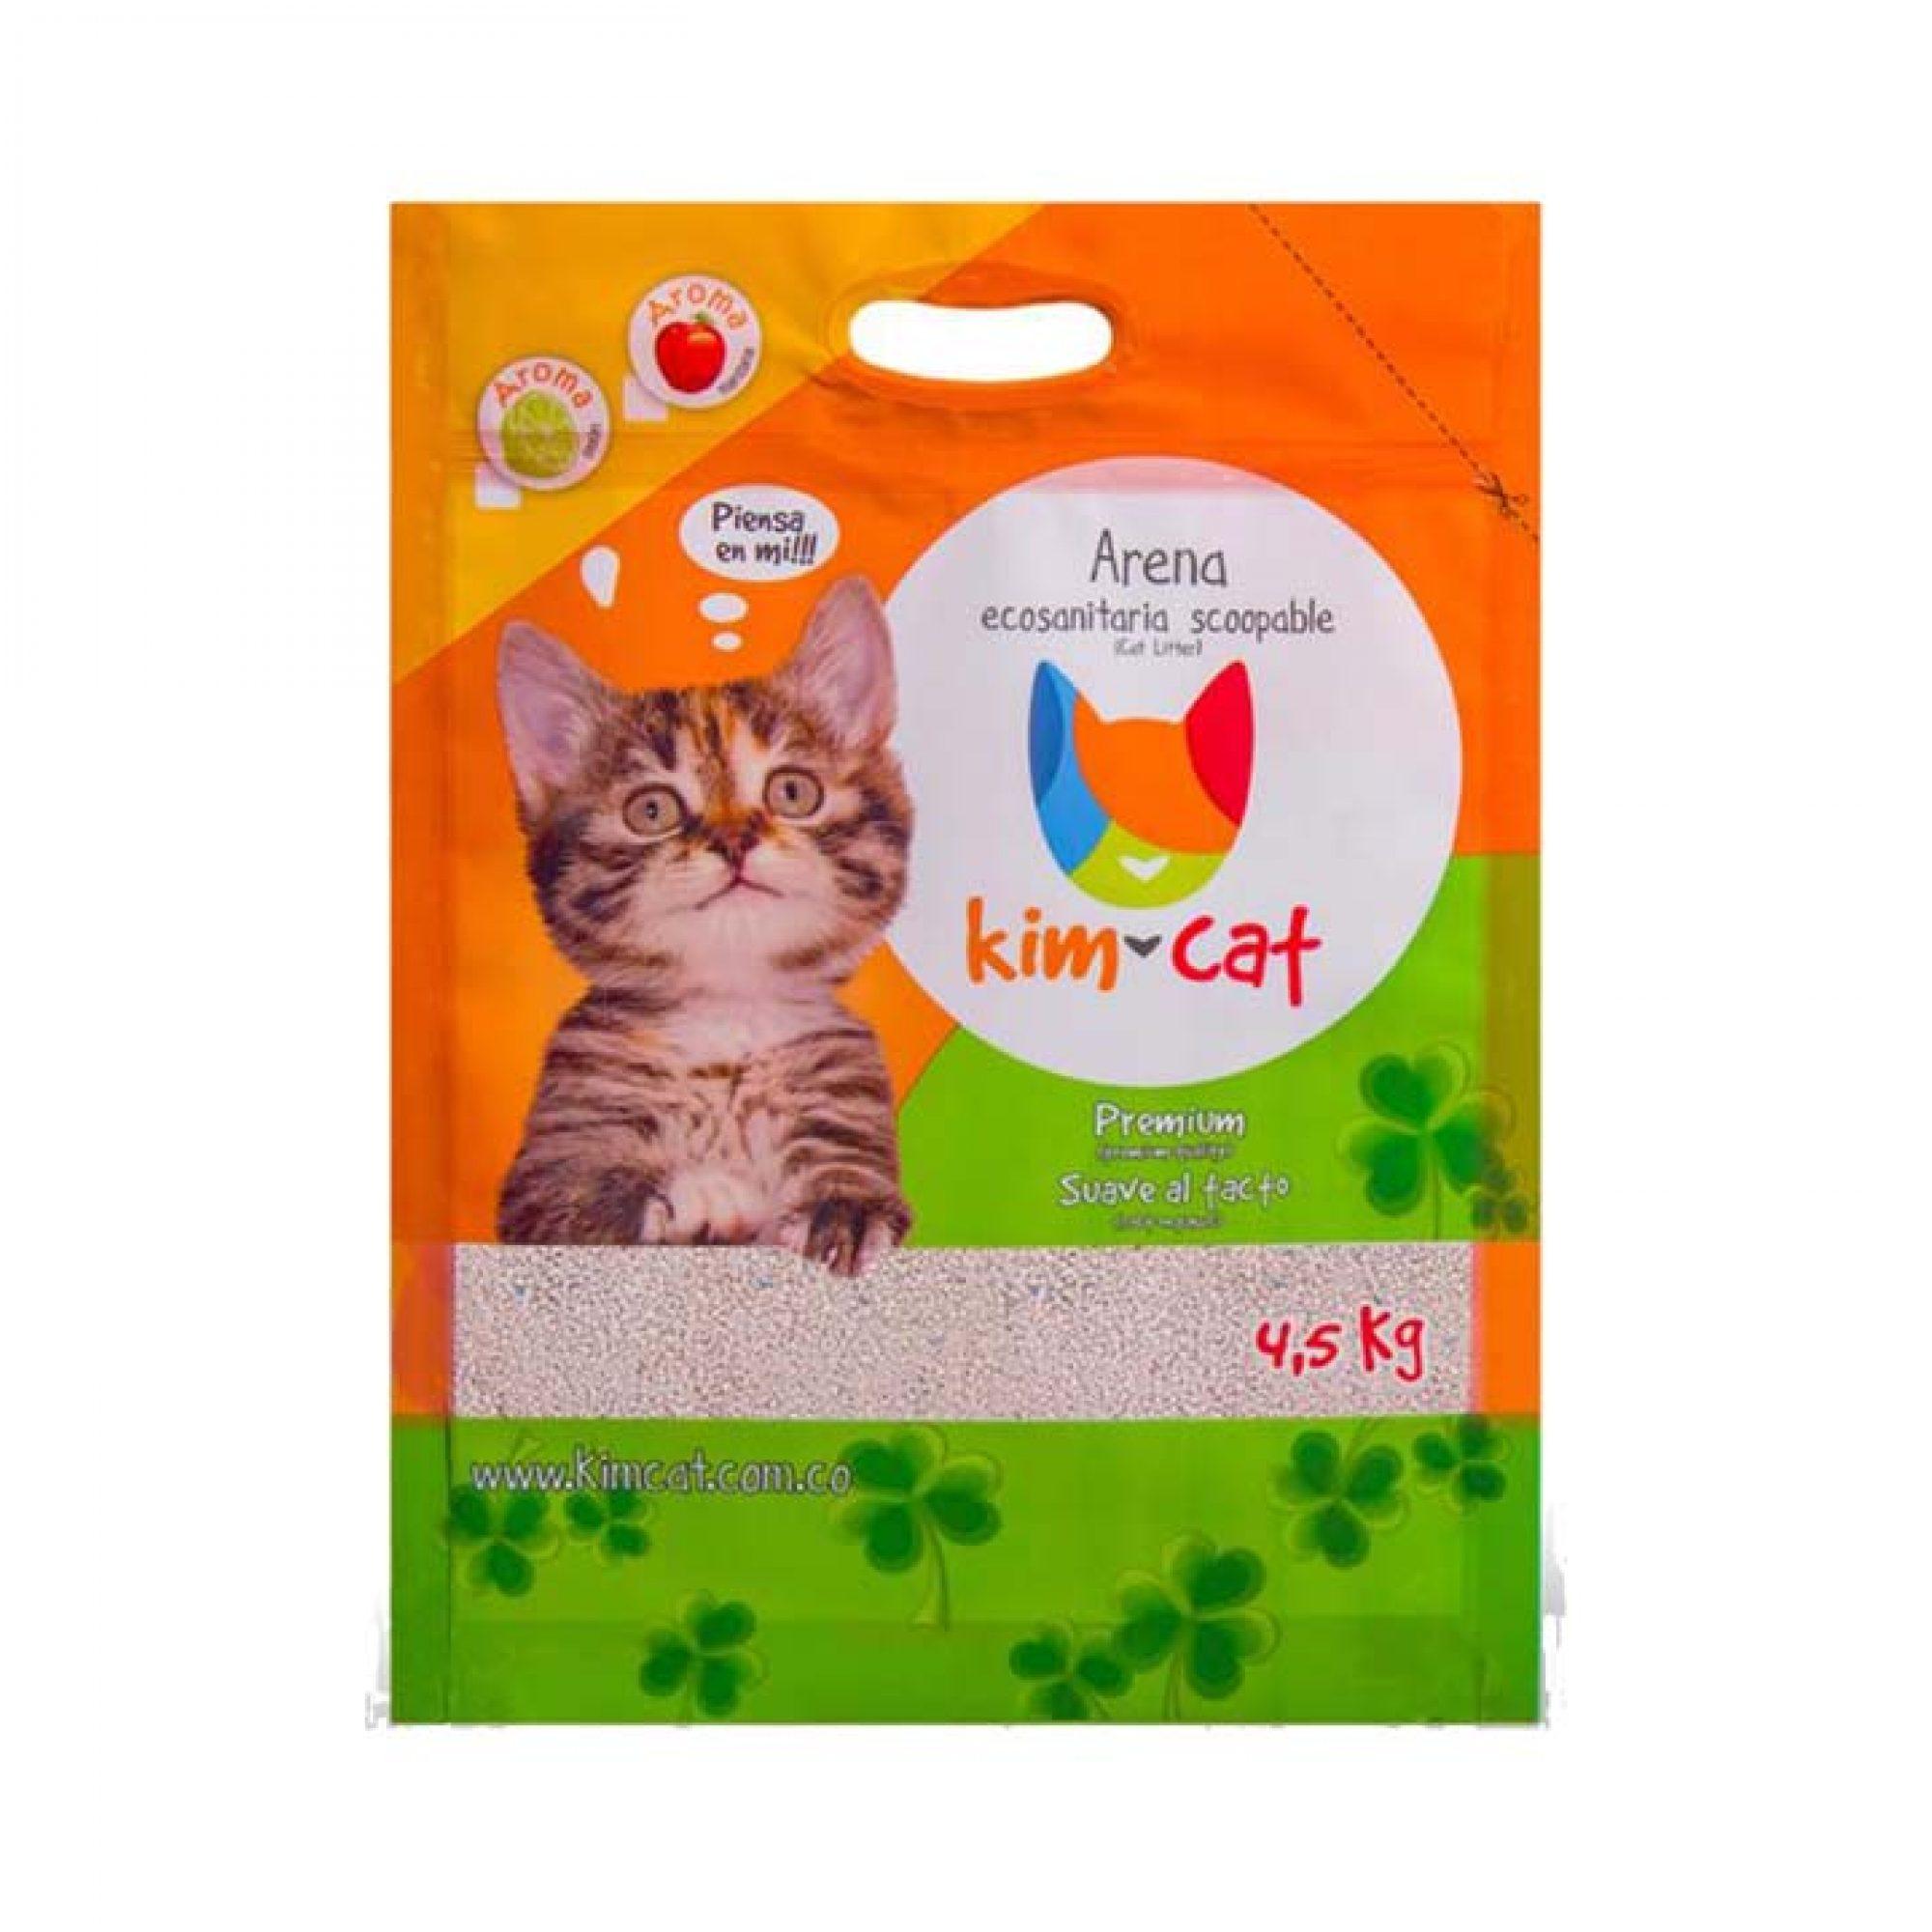 Arena Ecosanitaria Scoopable Kim Cat